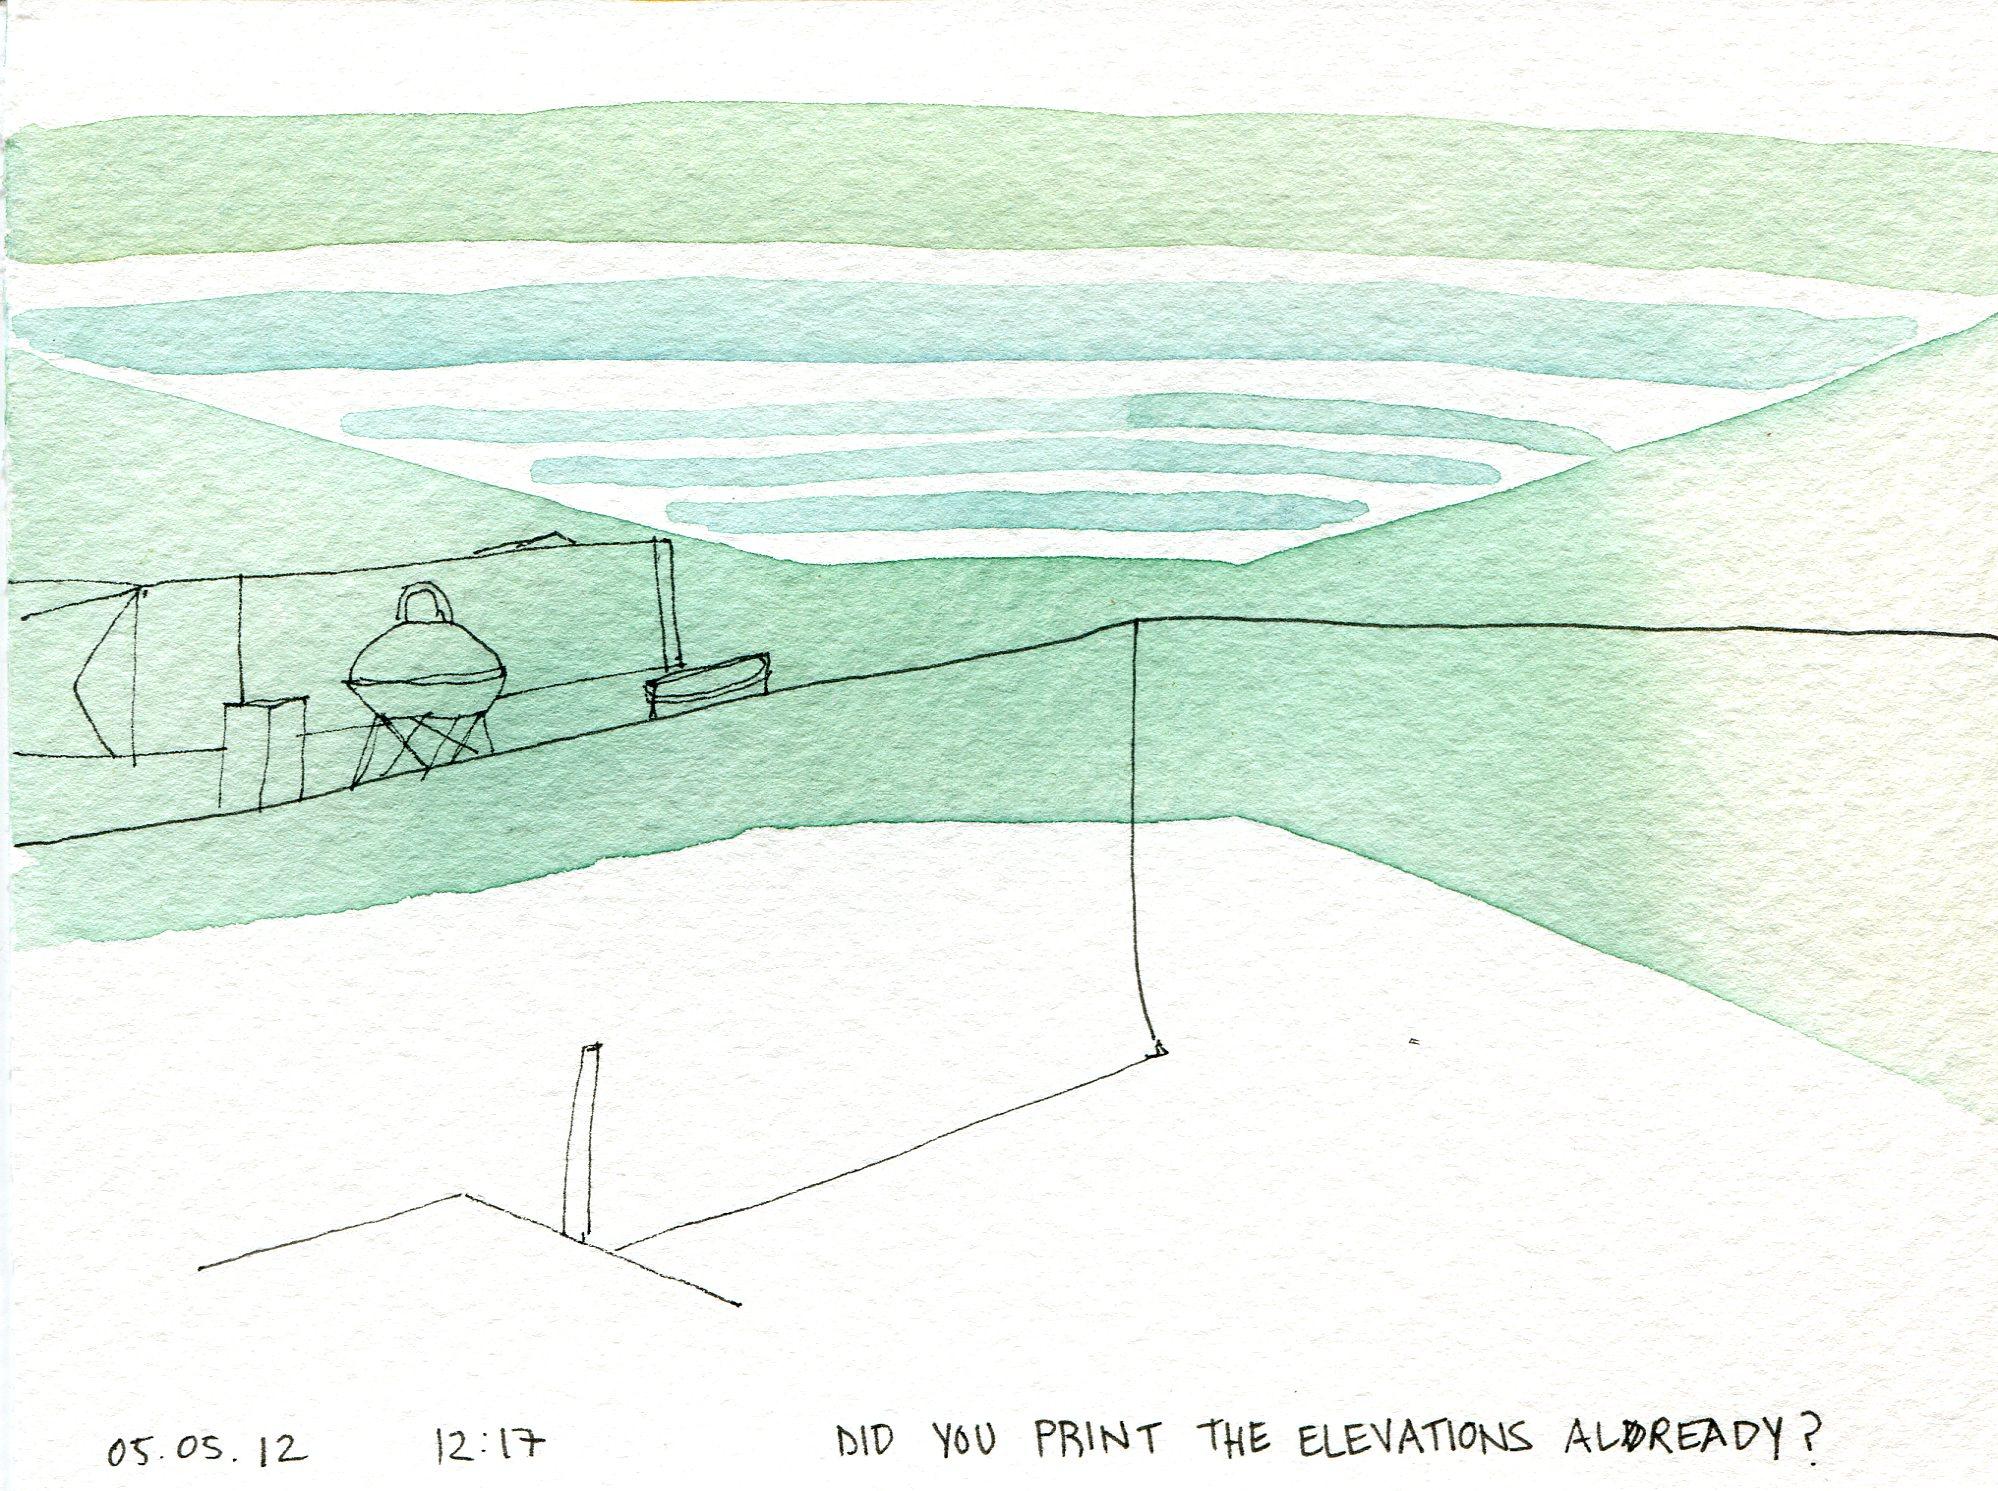 2012-05-05 drawing007.jpg